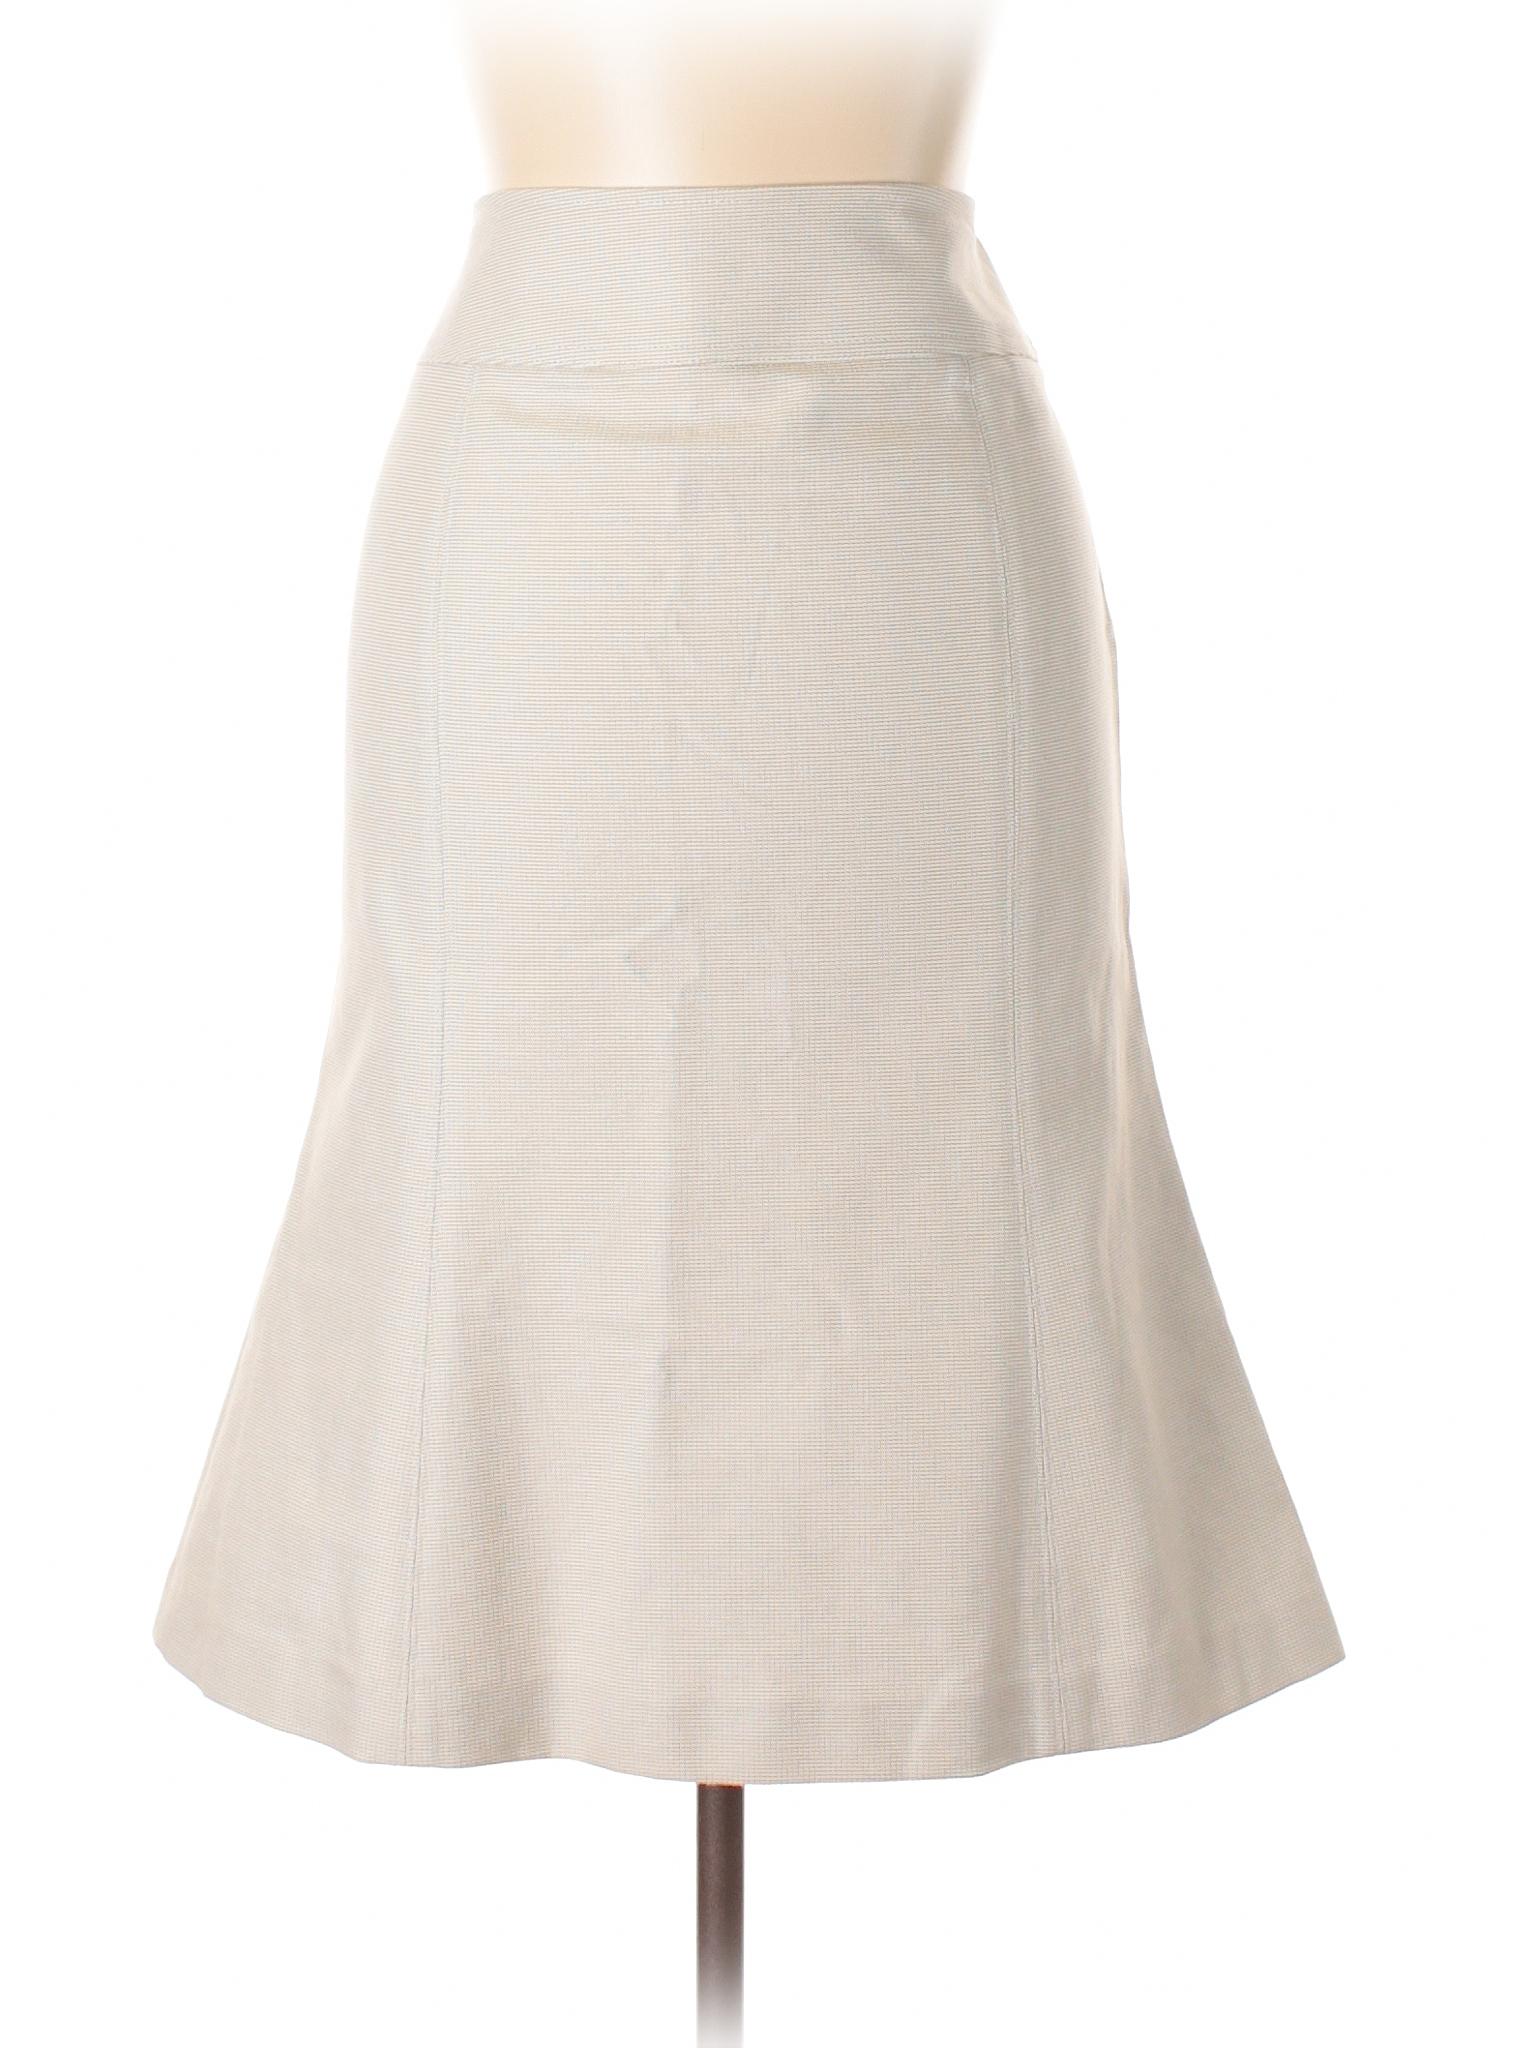 Skirt Boutique Boutique Casual Casual awqStvw